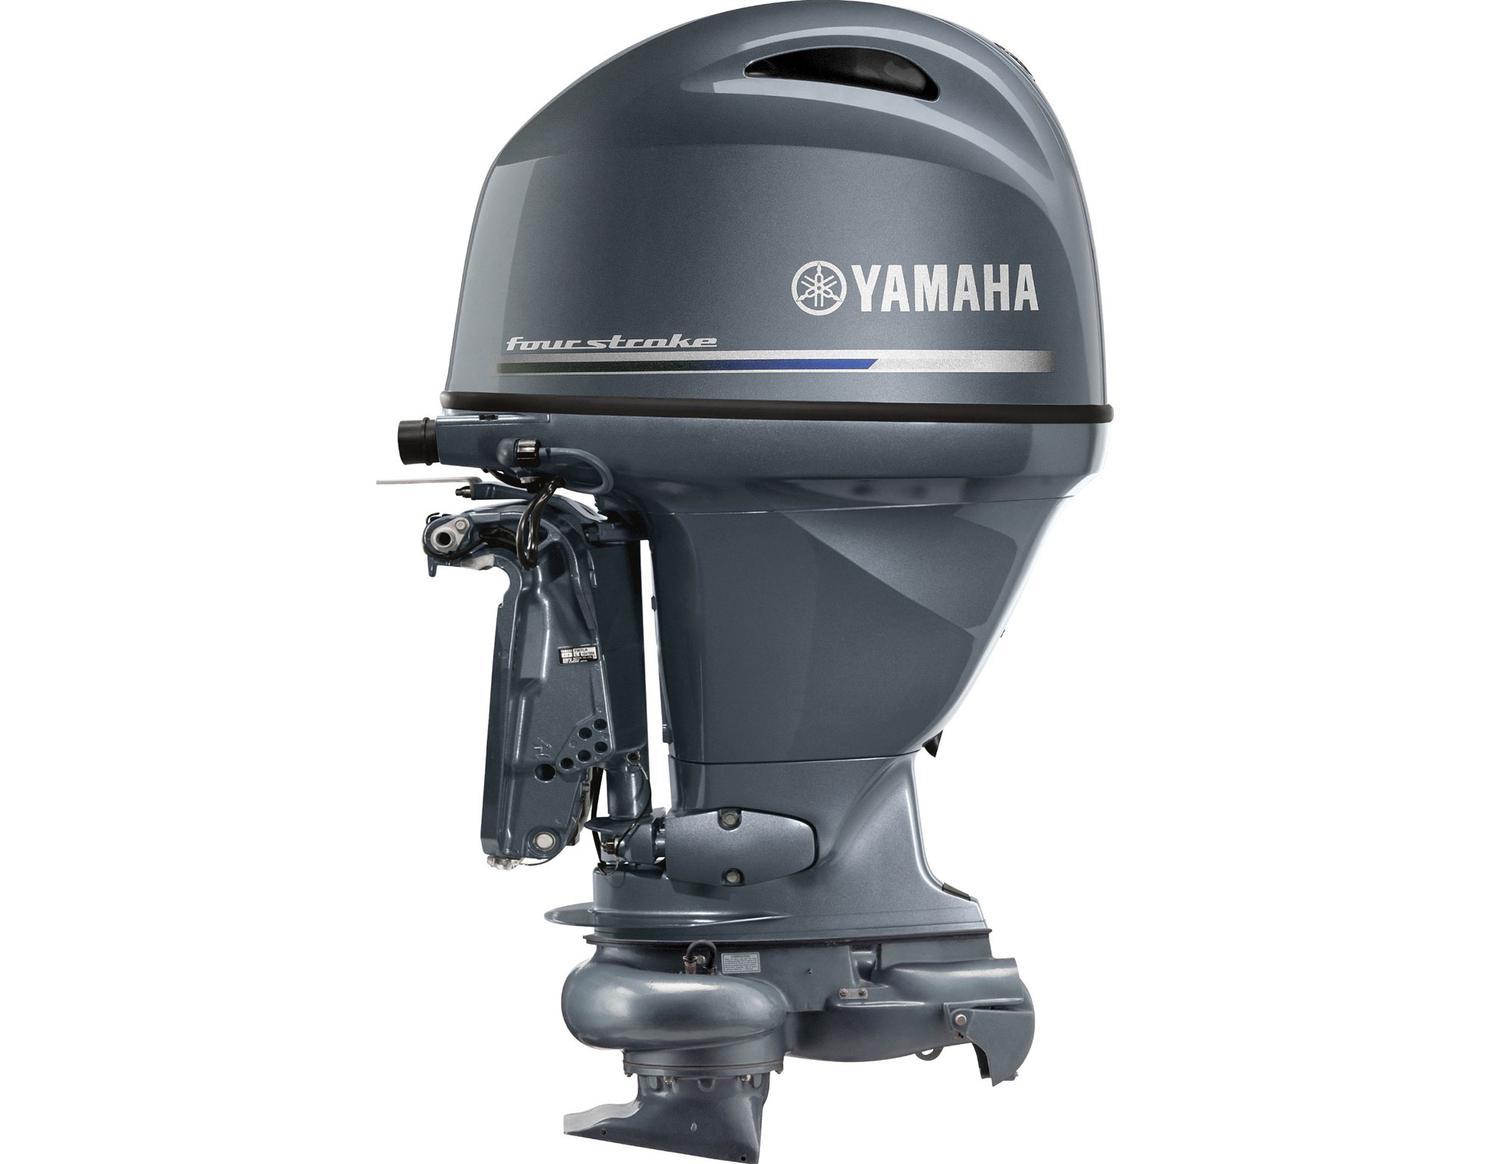 Yamaha F90 Jet Drive Bluish Gray Metallic